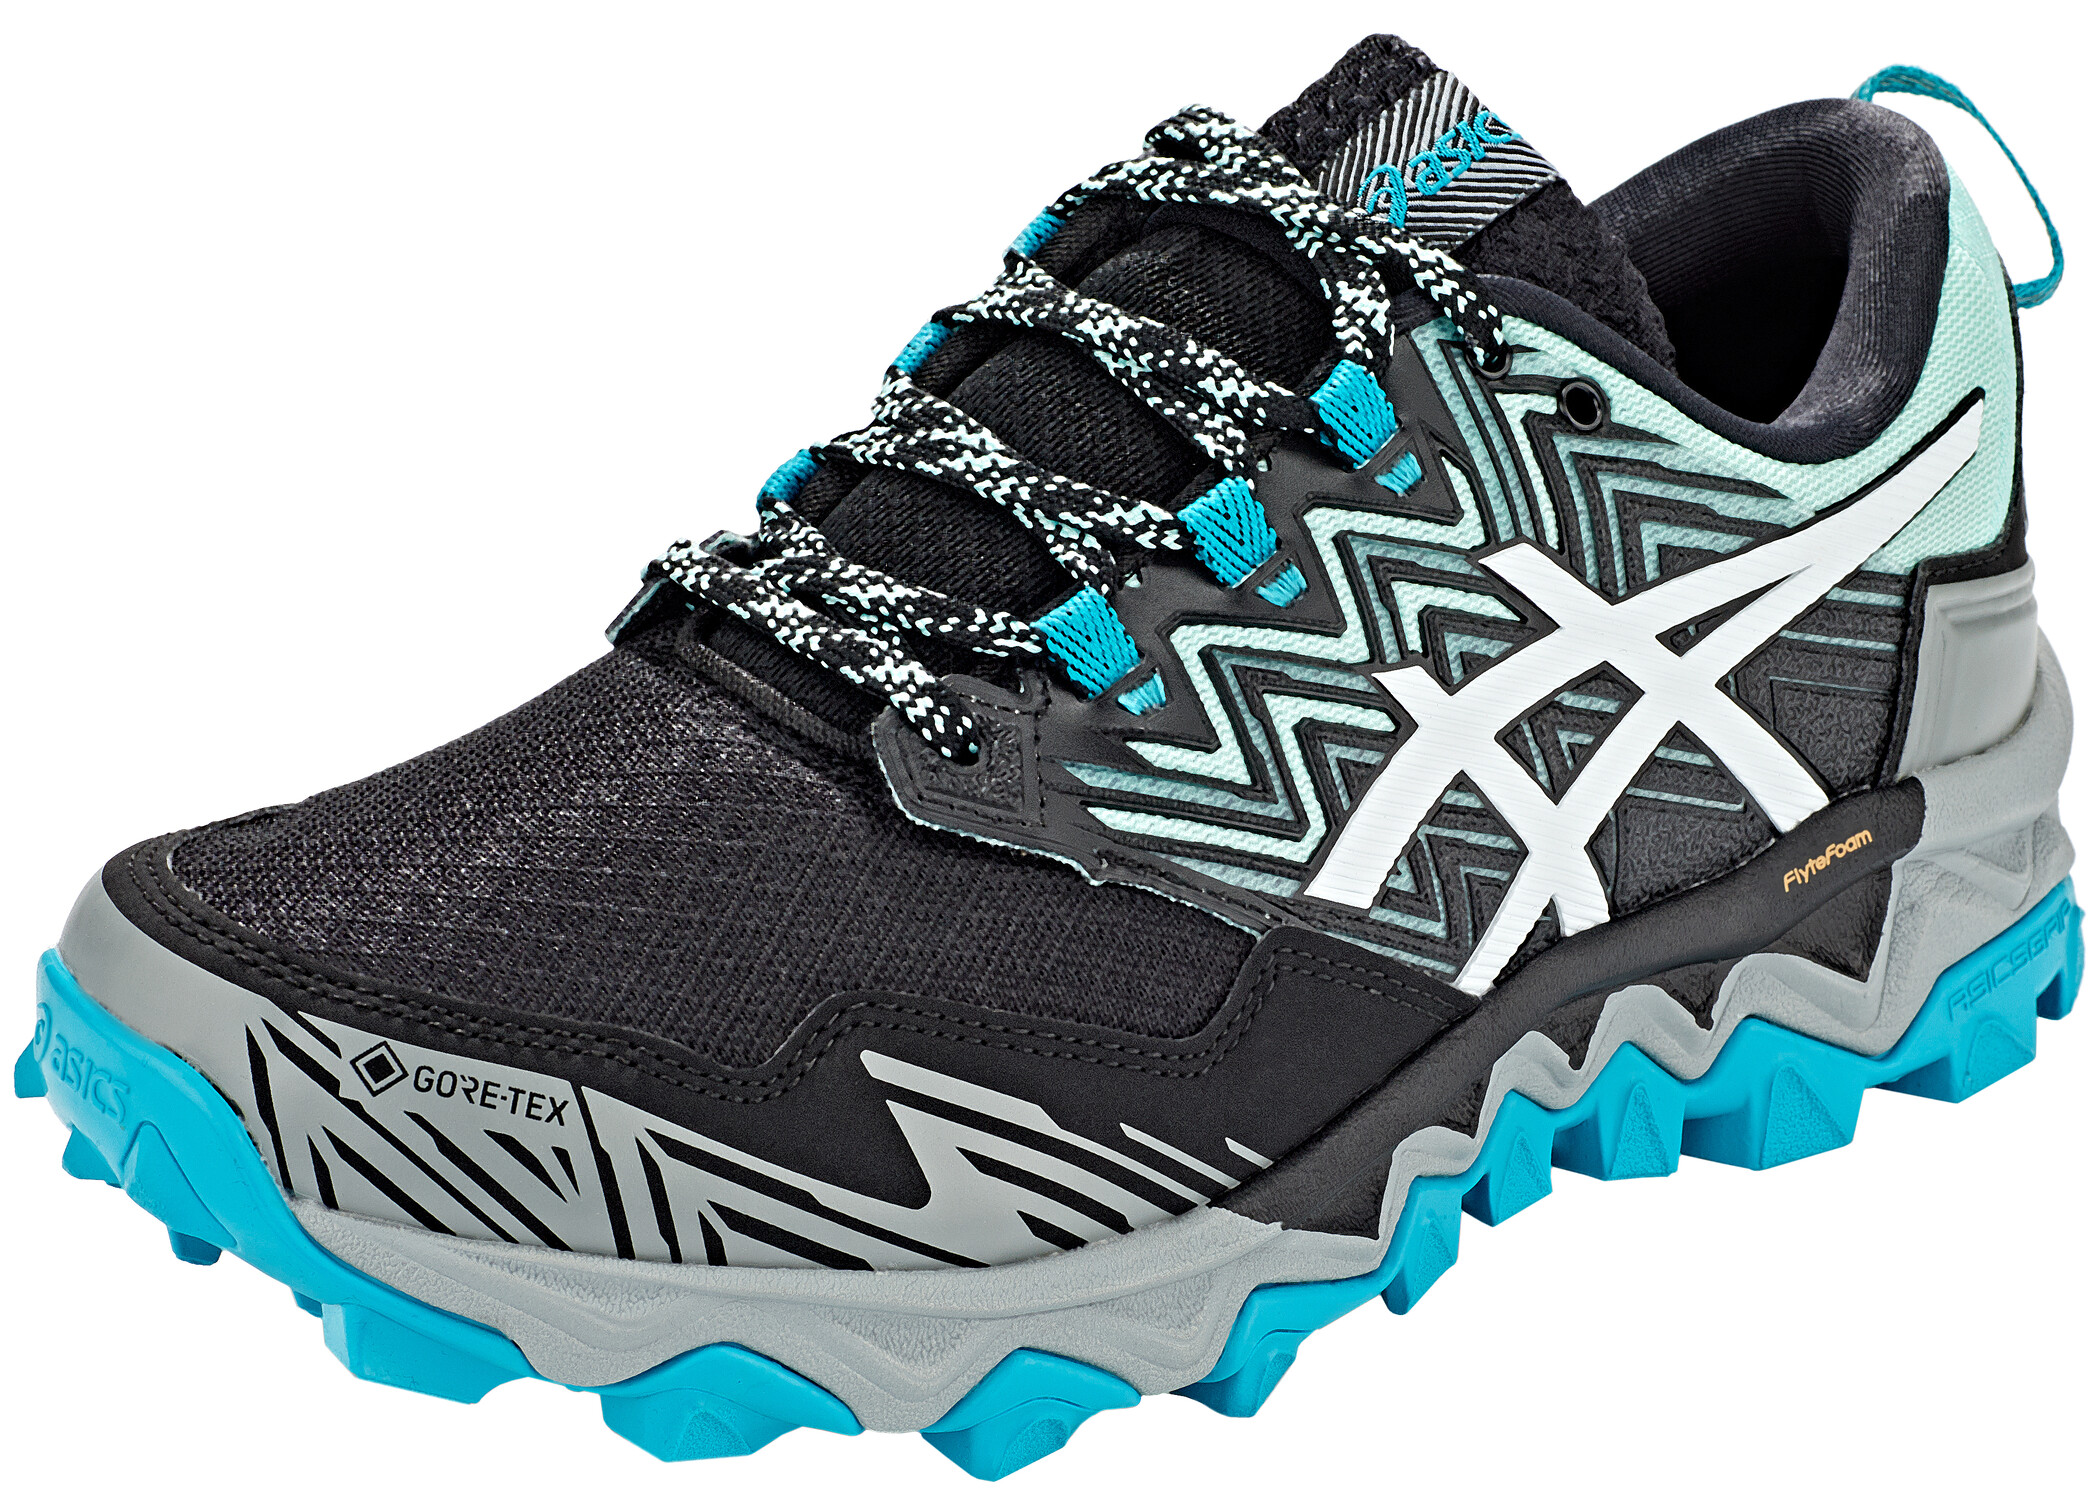 asics Gel Fujitrabuco 8 G Tx Shoes Women fresh icewhite